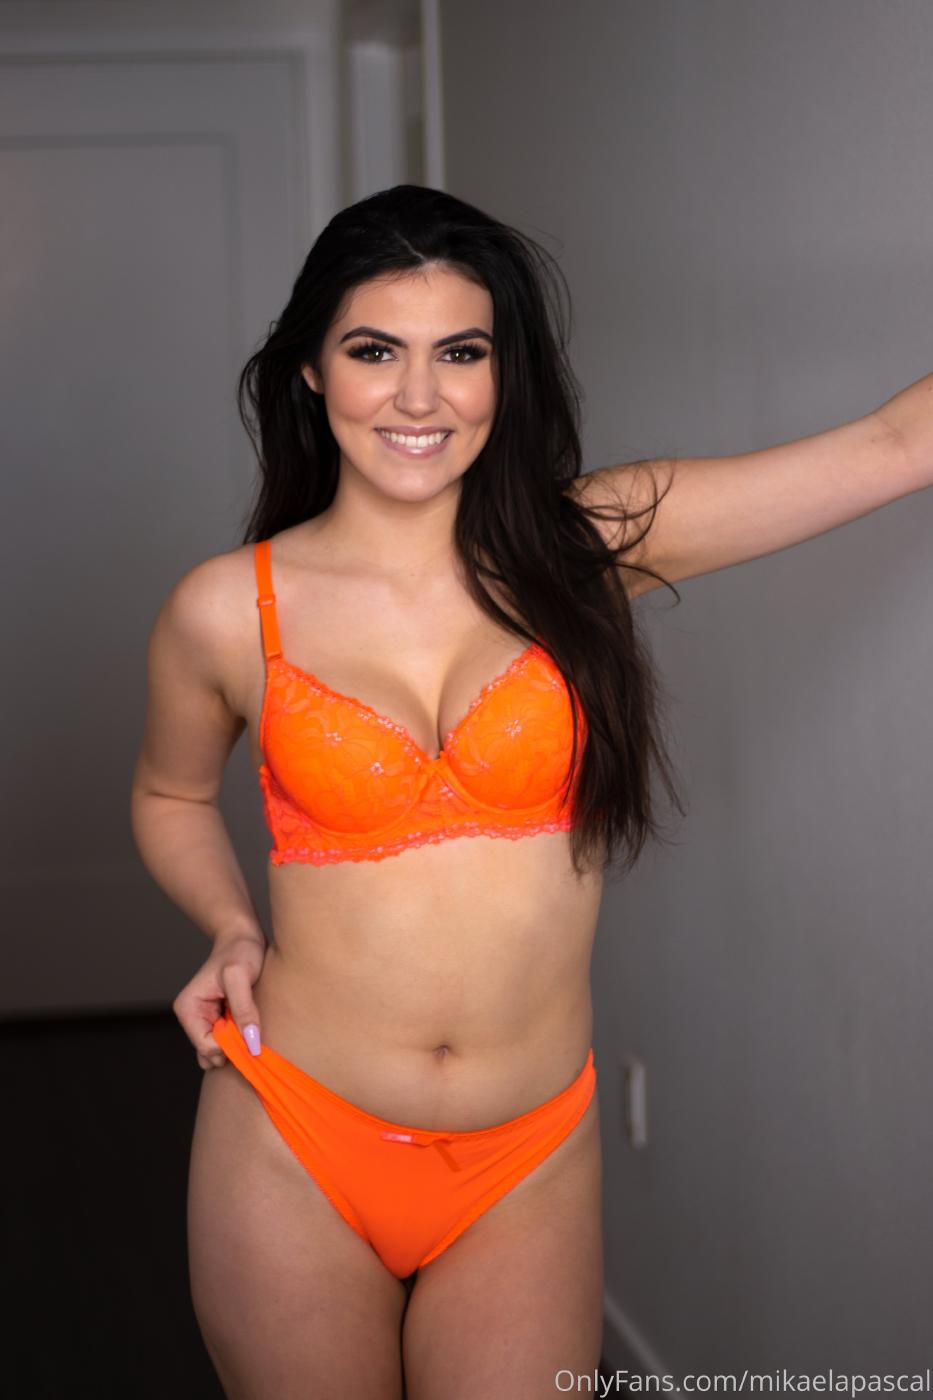 Mikaela Pascal Orange Lingerie Onlyfans Set Leaked 0004